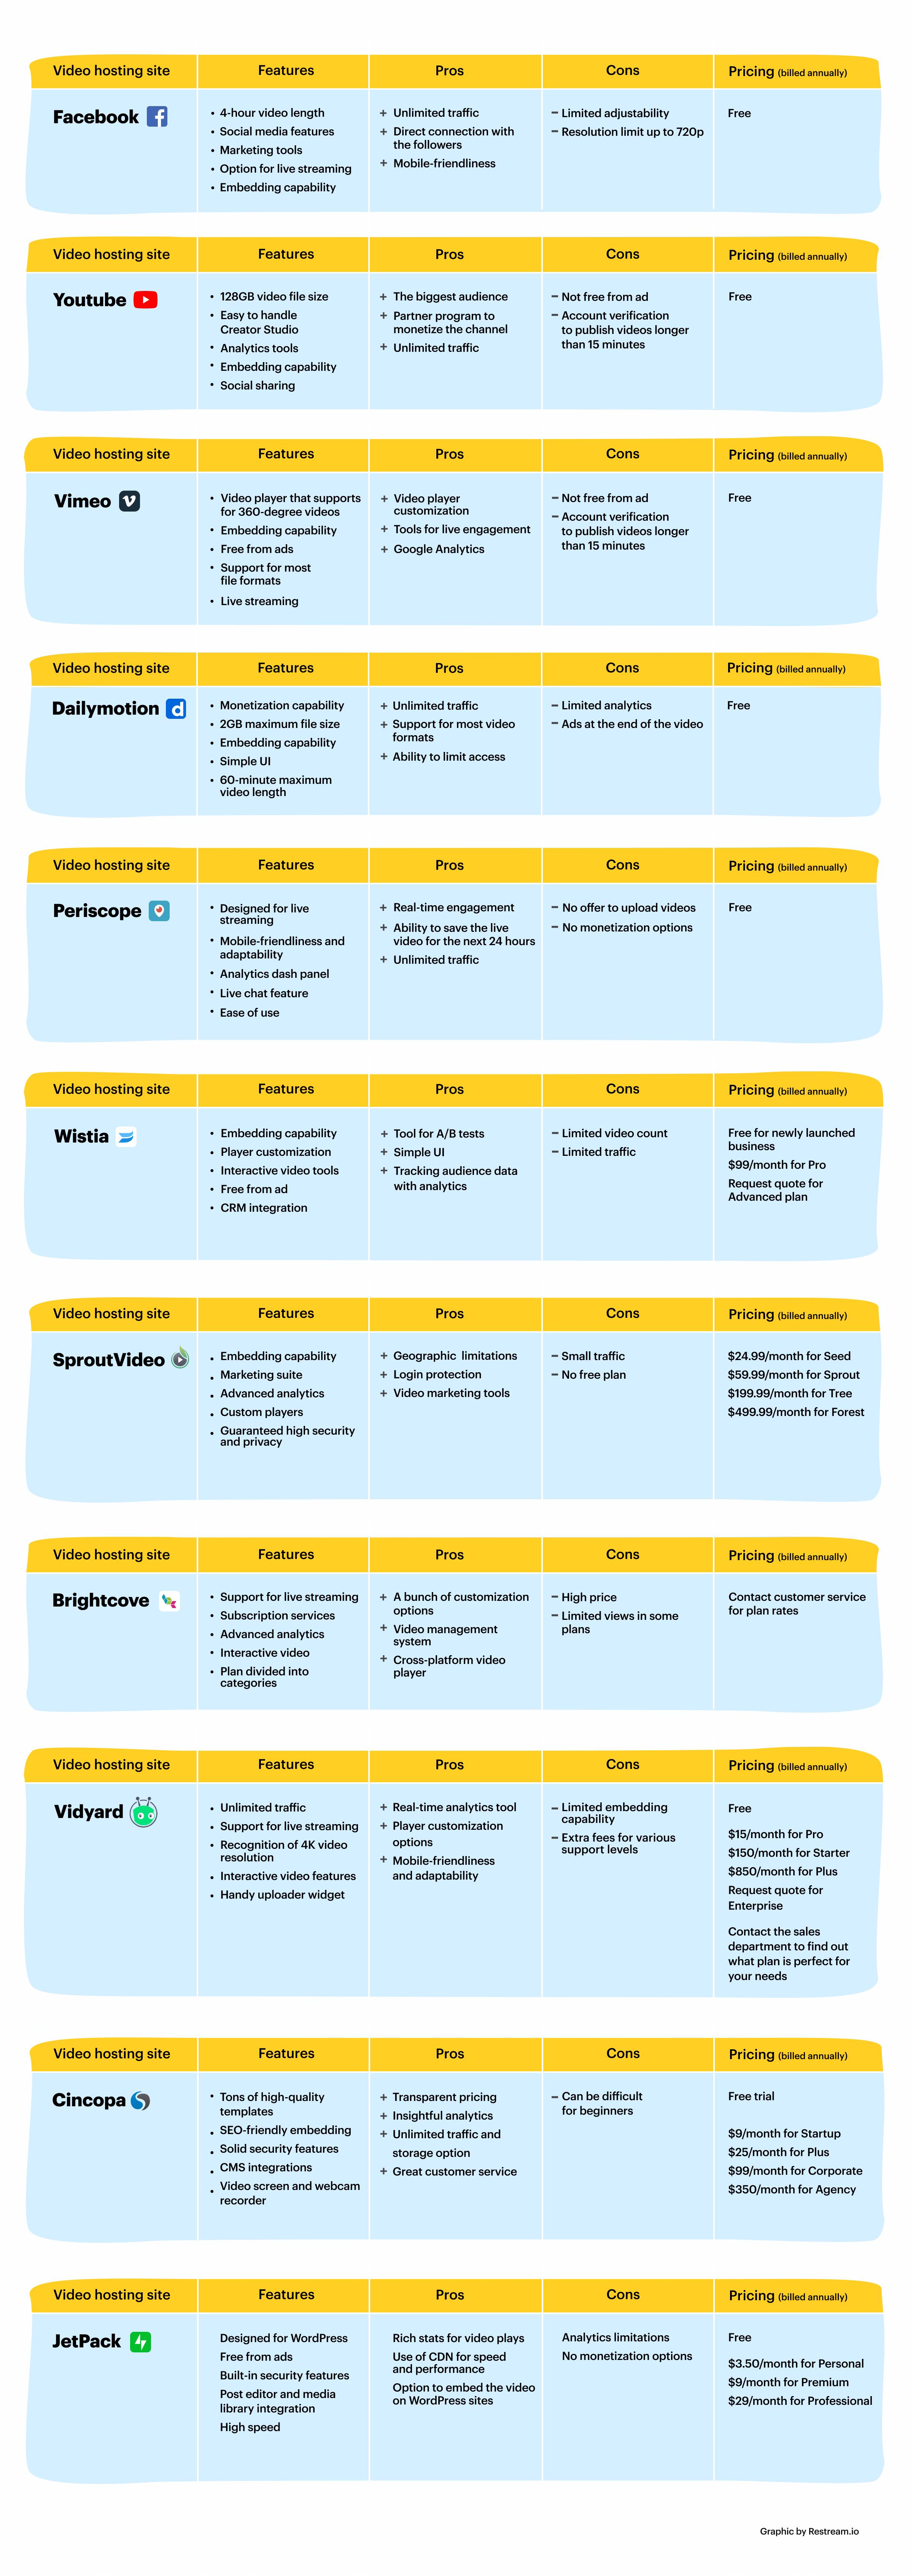 Best video hosting sites comparison